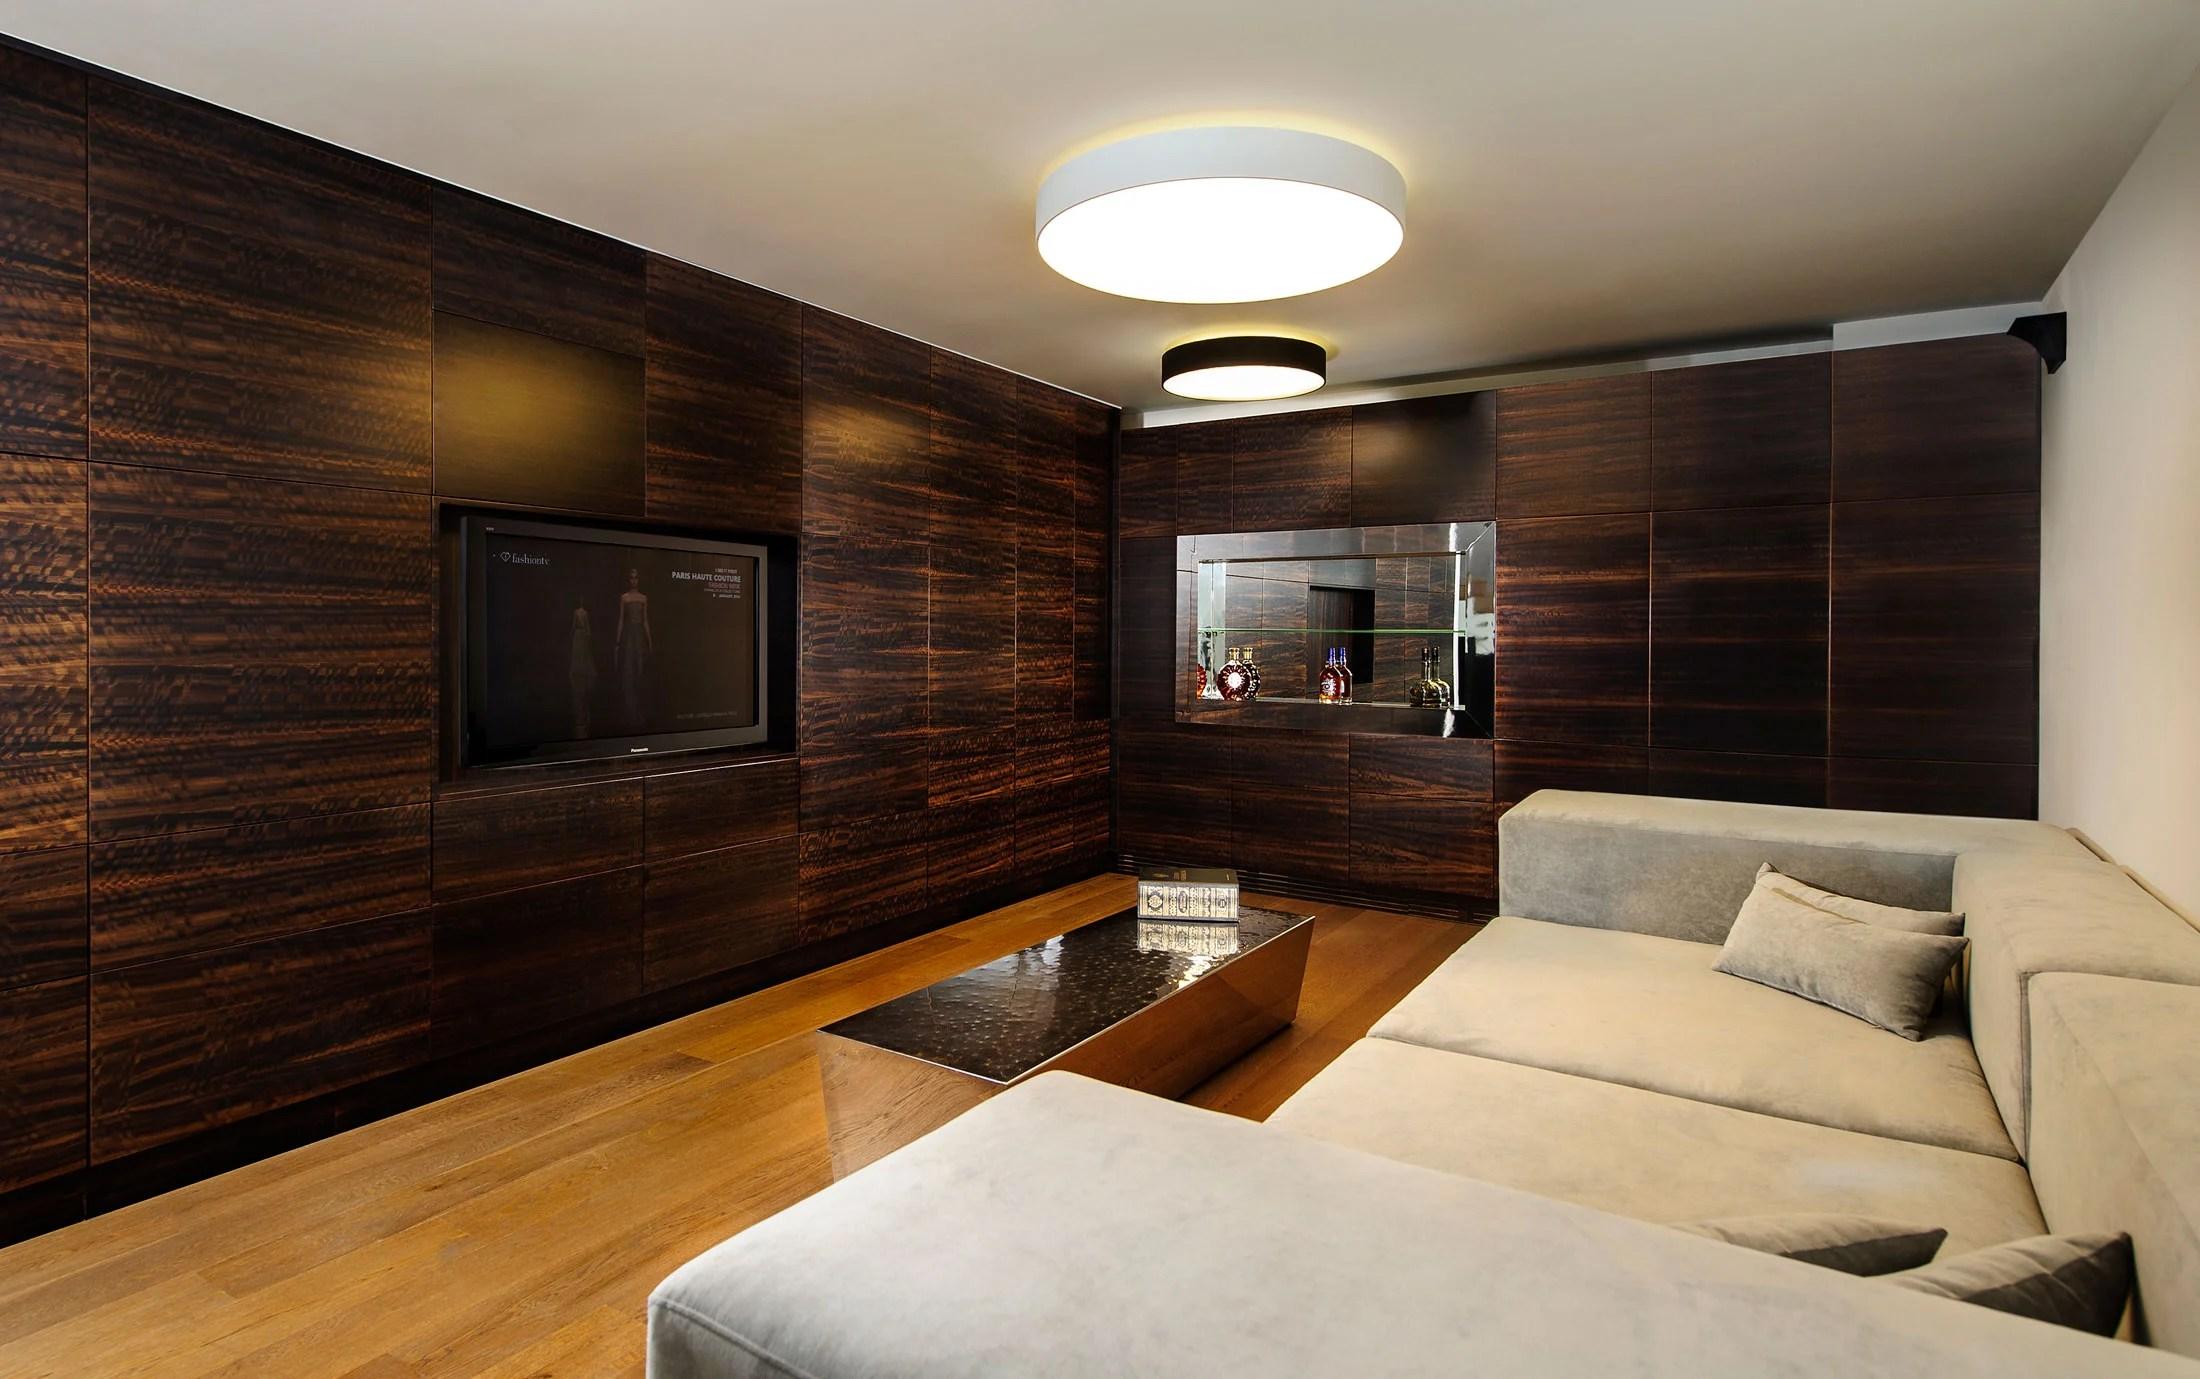 The Hidden Home in Tel Aviv by Israelevitz Architects